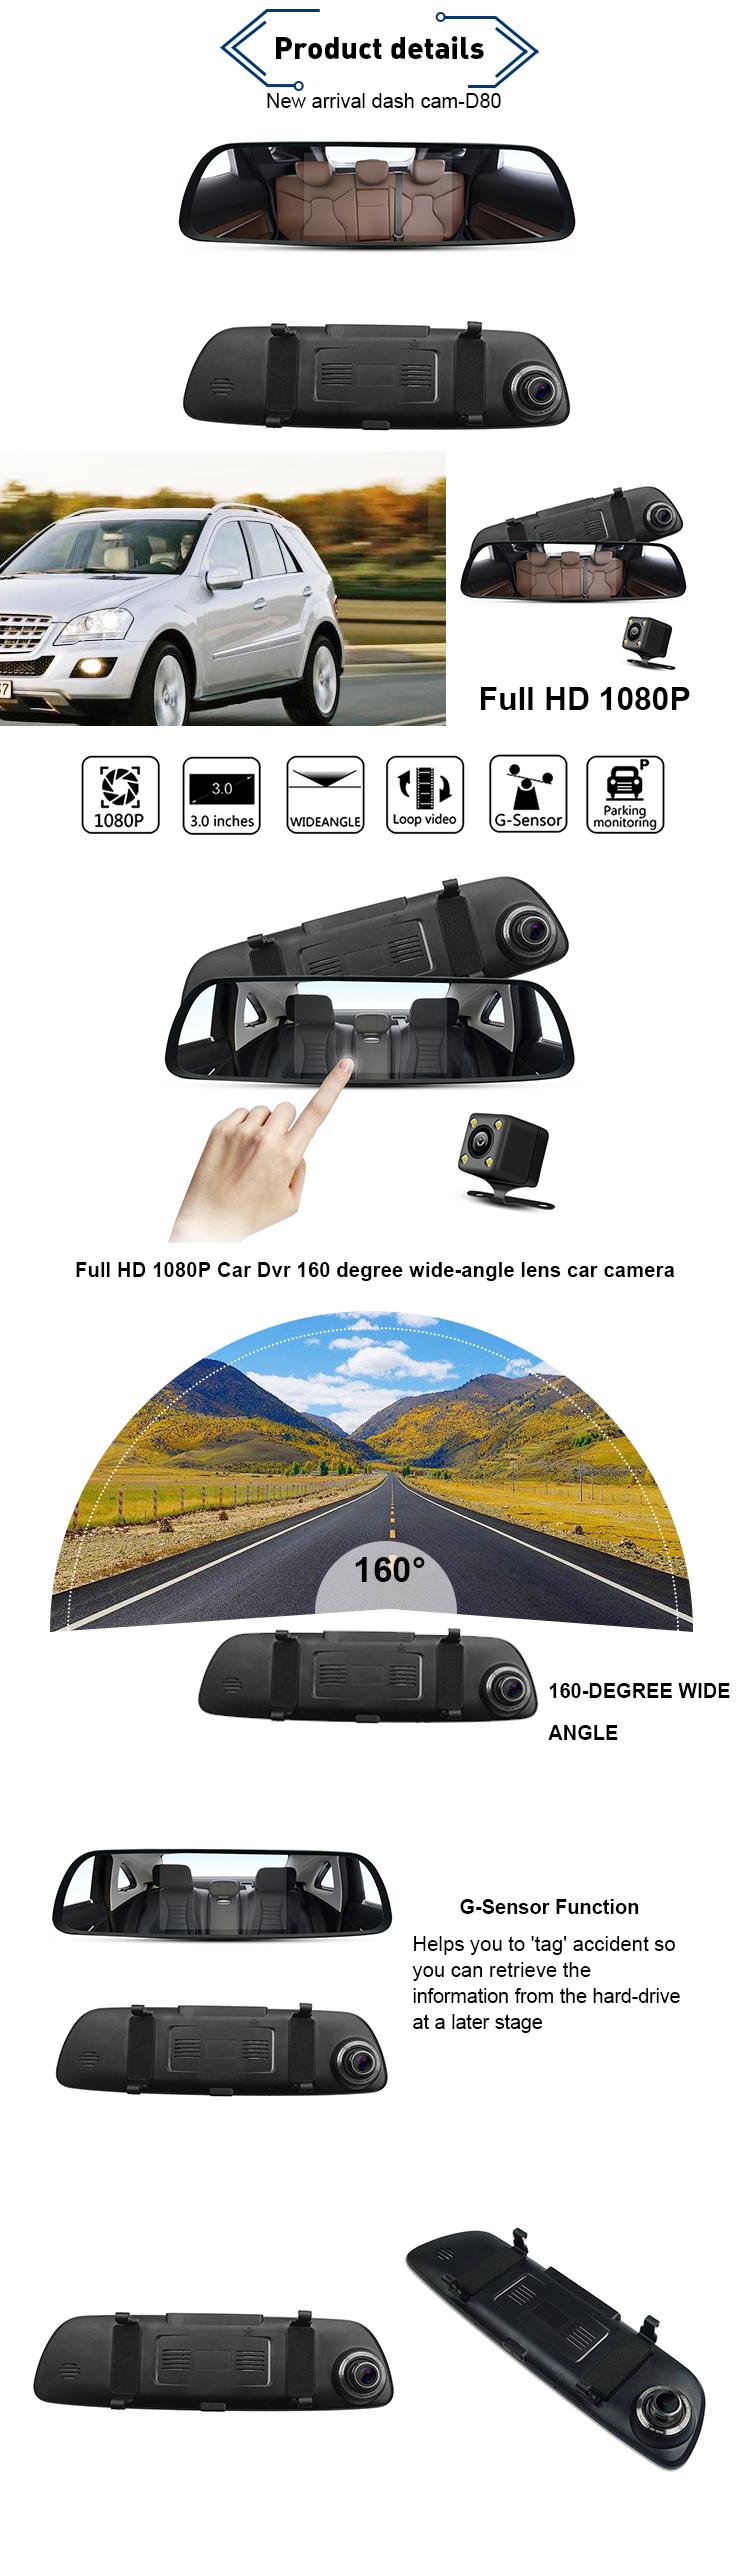 2.0M 150 degree full HD 1080p 5.0''IPS Touch screen black box dash cam adas radar detector with car dvr camera